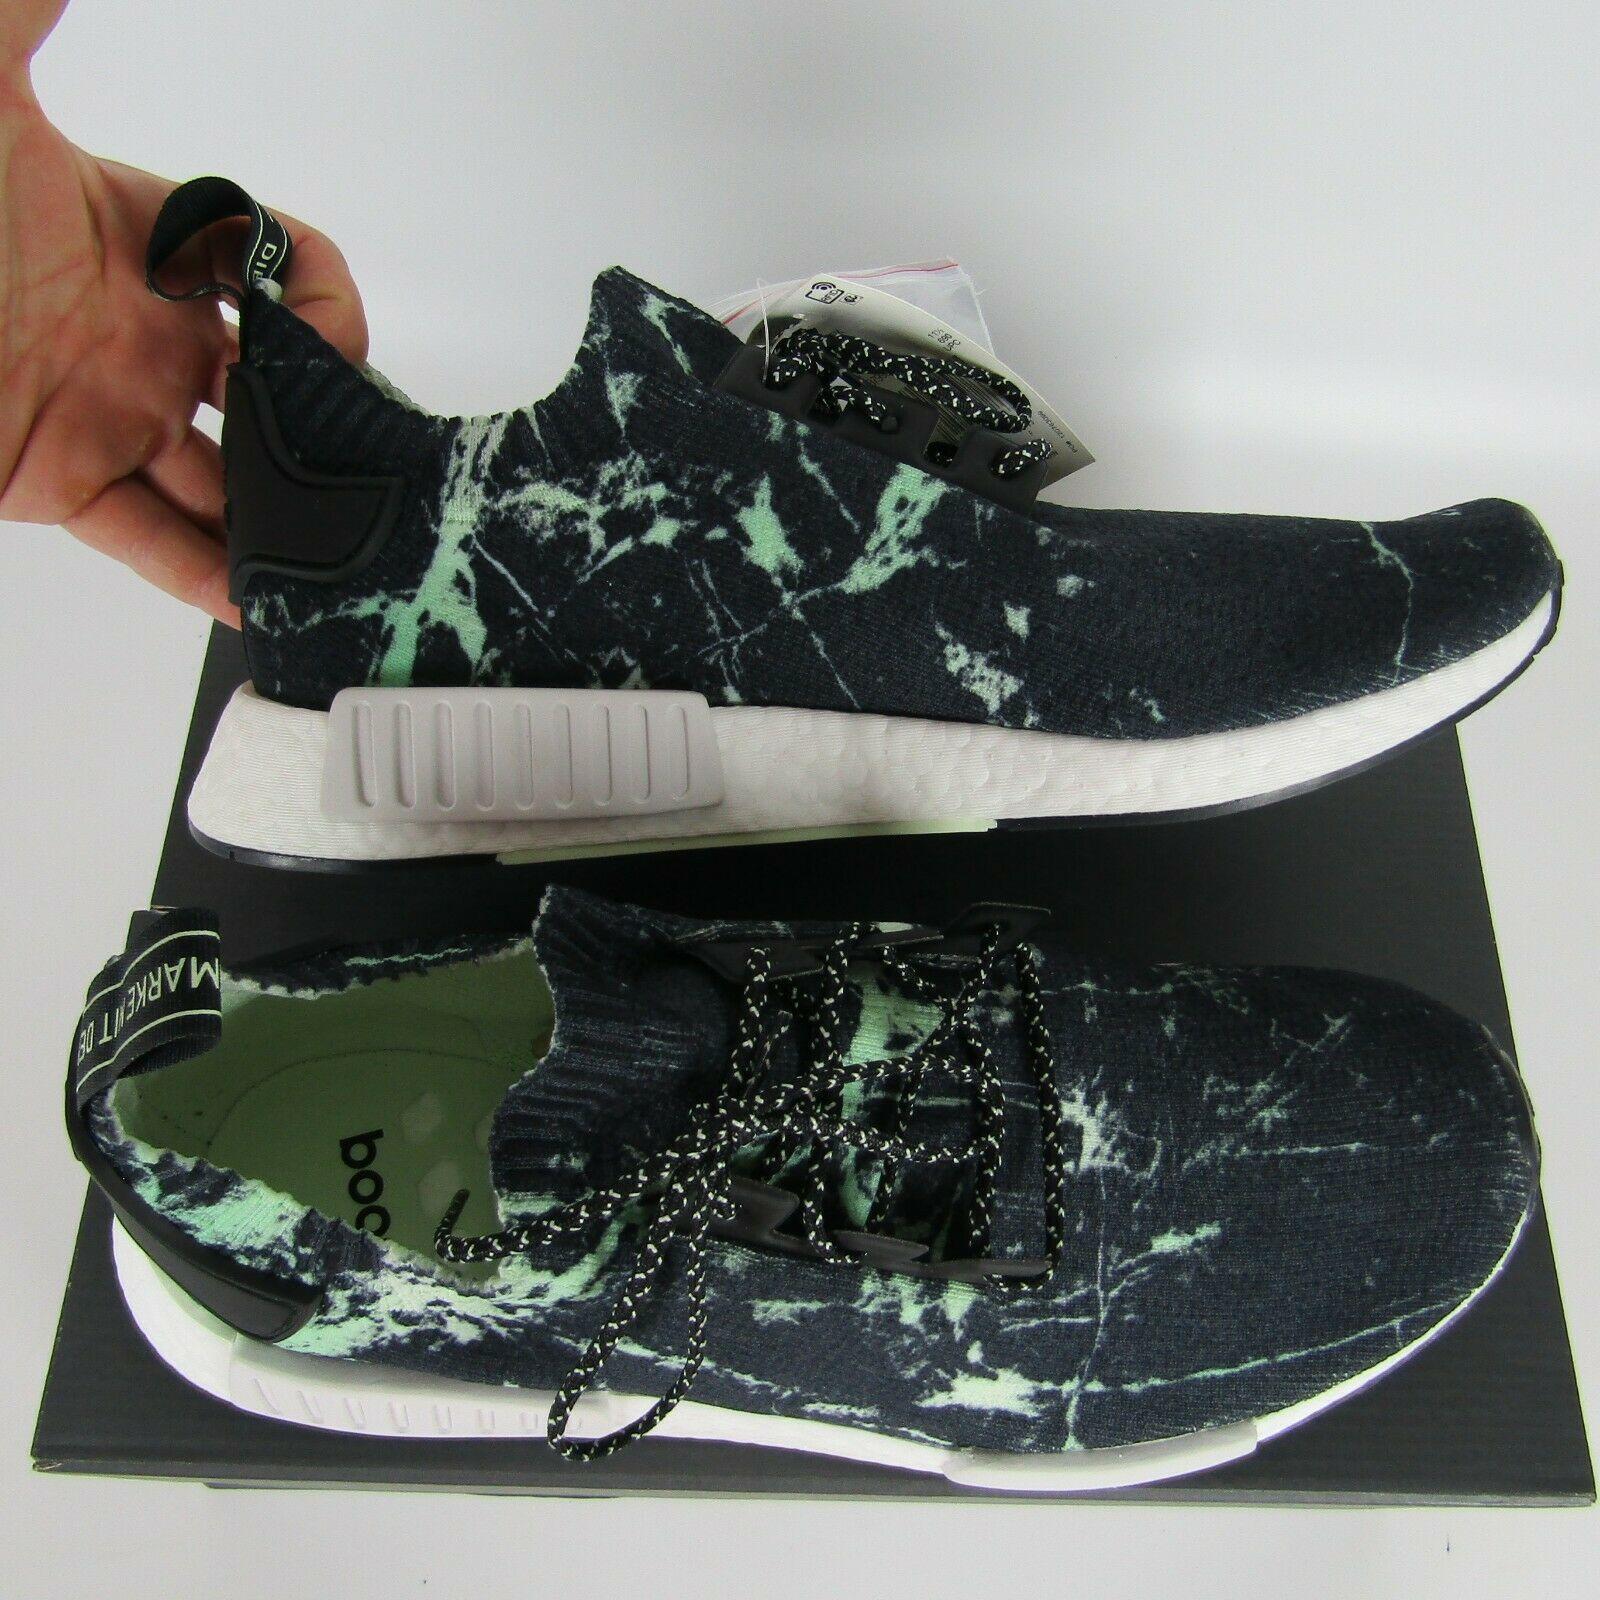 "Adidas Nmd_R1 Primeknit "" Grün Marmor "" Schuhe Herren Größe 12 BB7996 image 6"